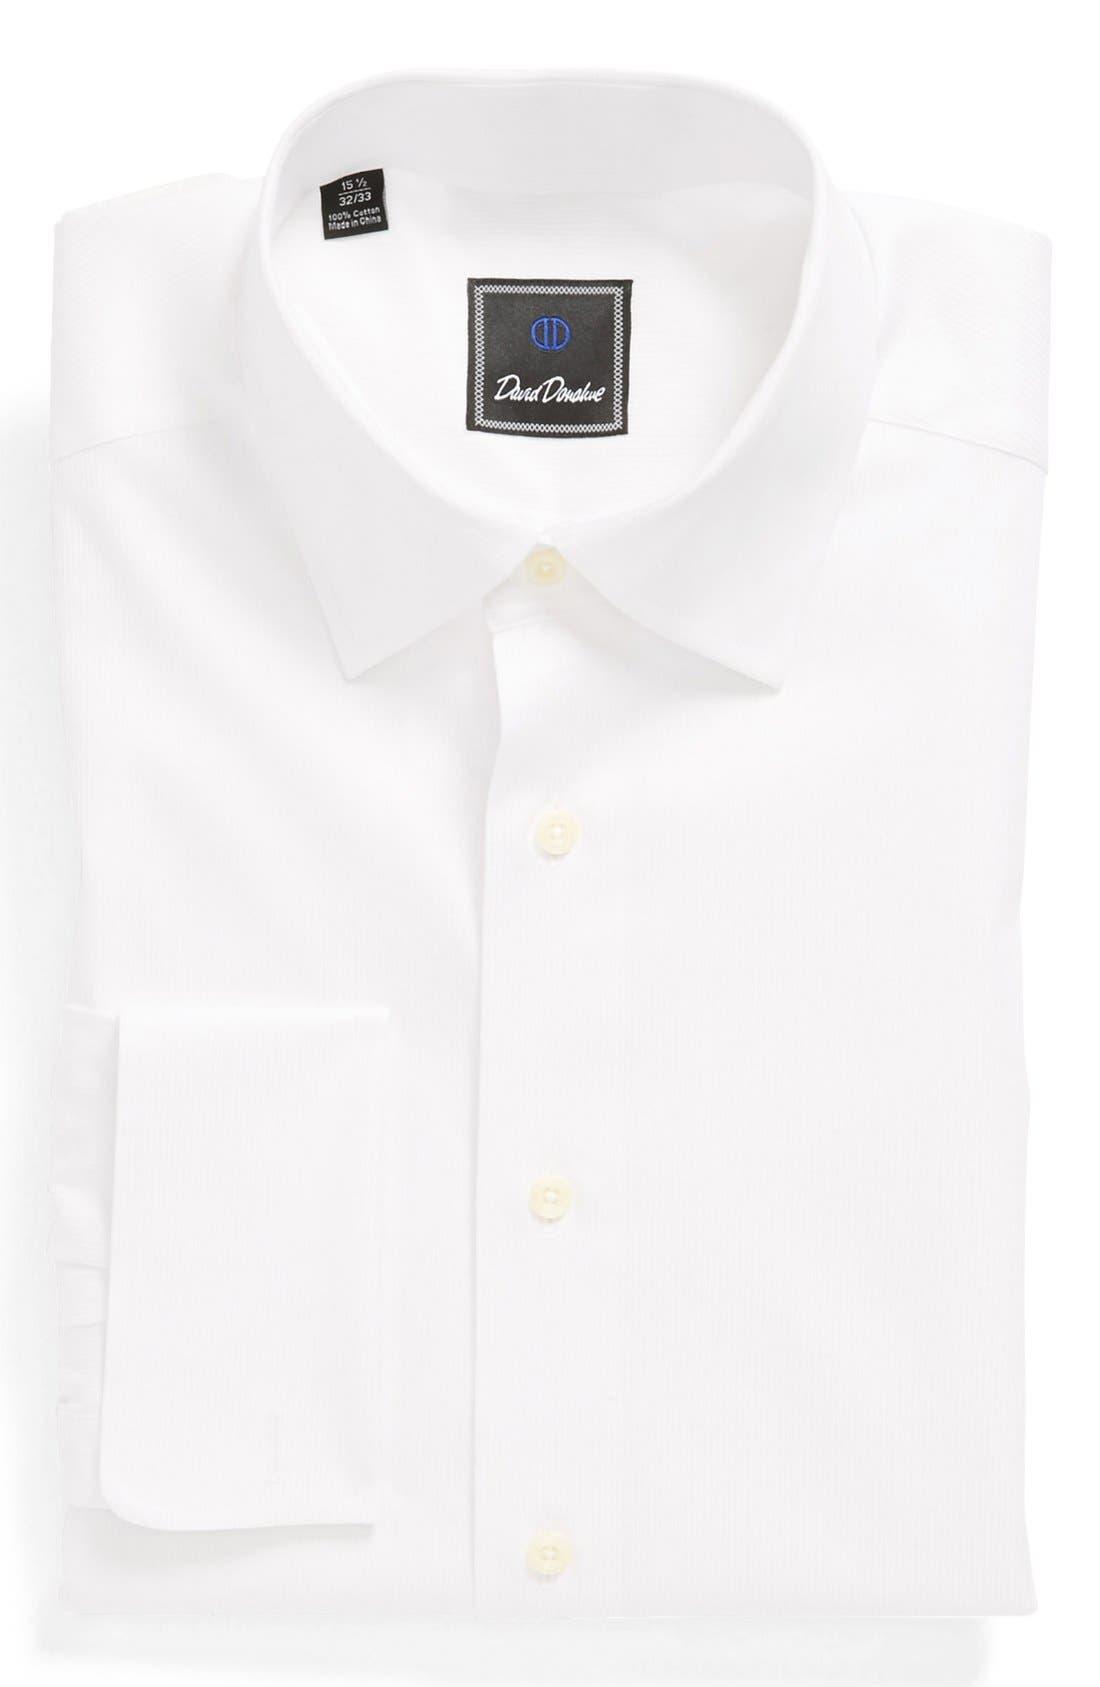 Alternate Image 1 Selected - David Donahue French Cuff Regular Fit Dress Shirt